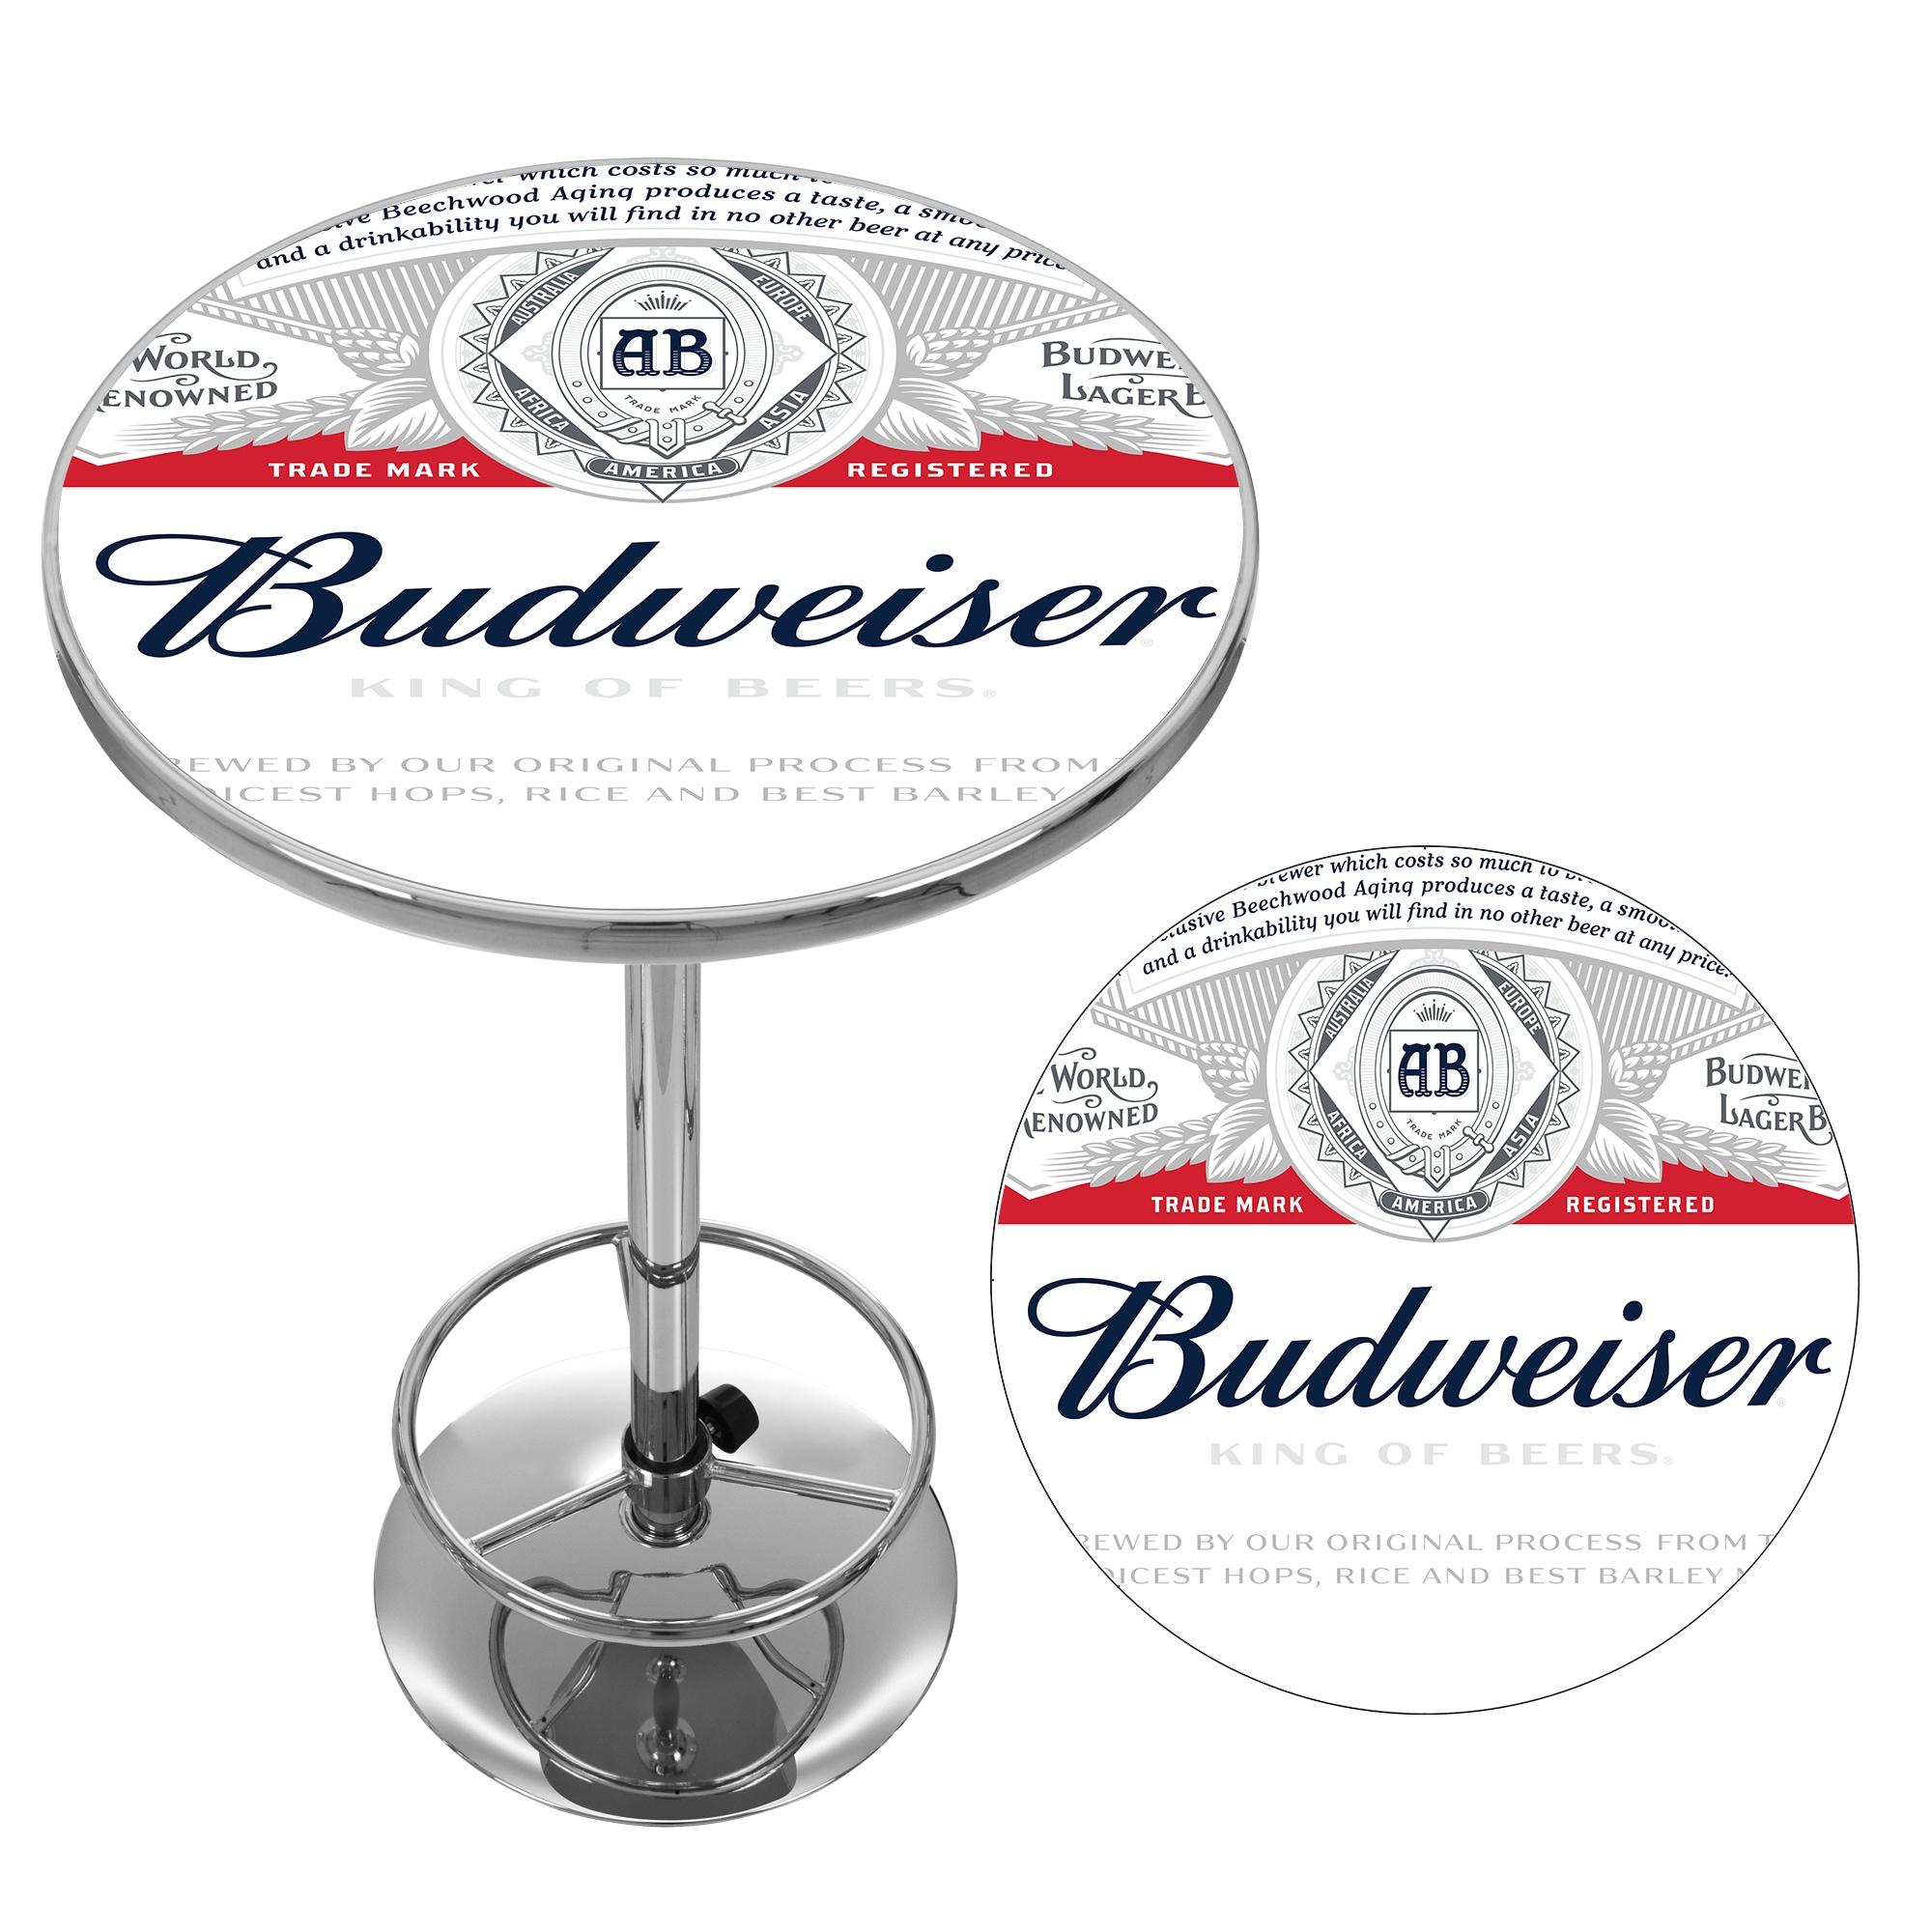 Budweiser chrome pub table label design free shipping today budweiser chrome pub table label design free shipping today overstock 17740816 watchthetrailerfo